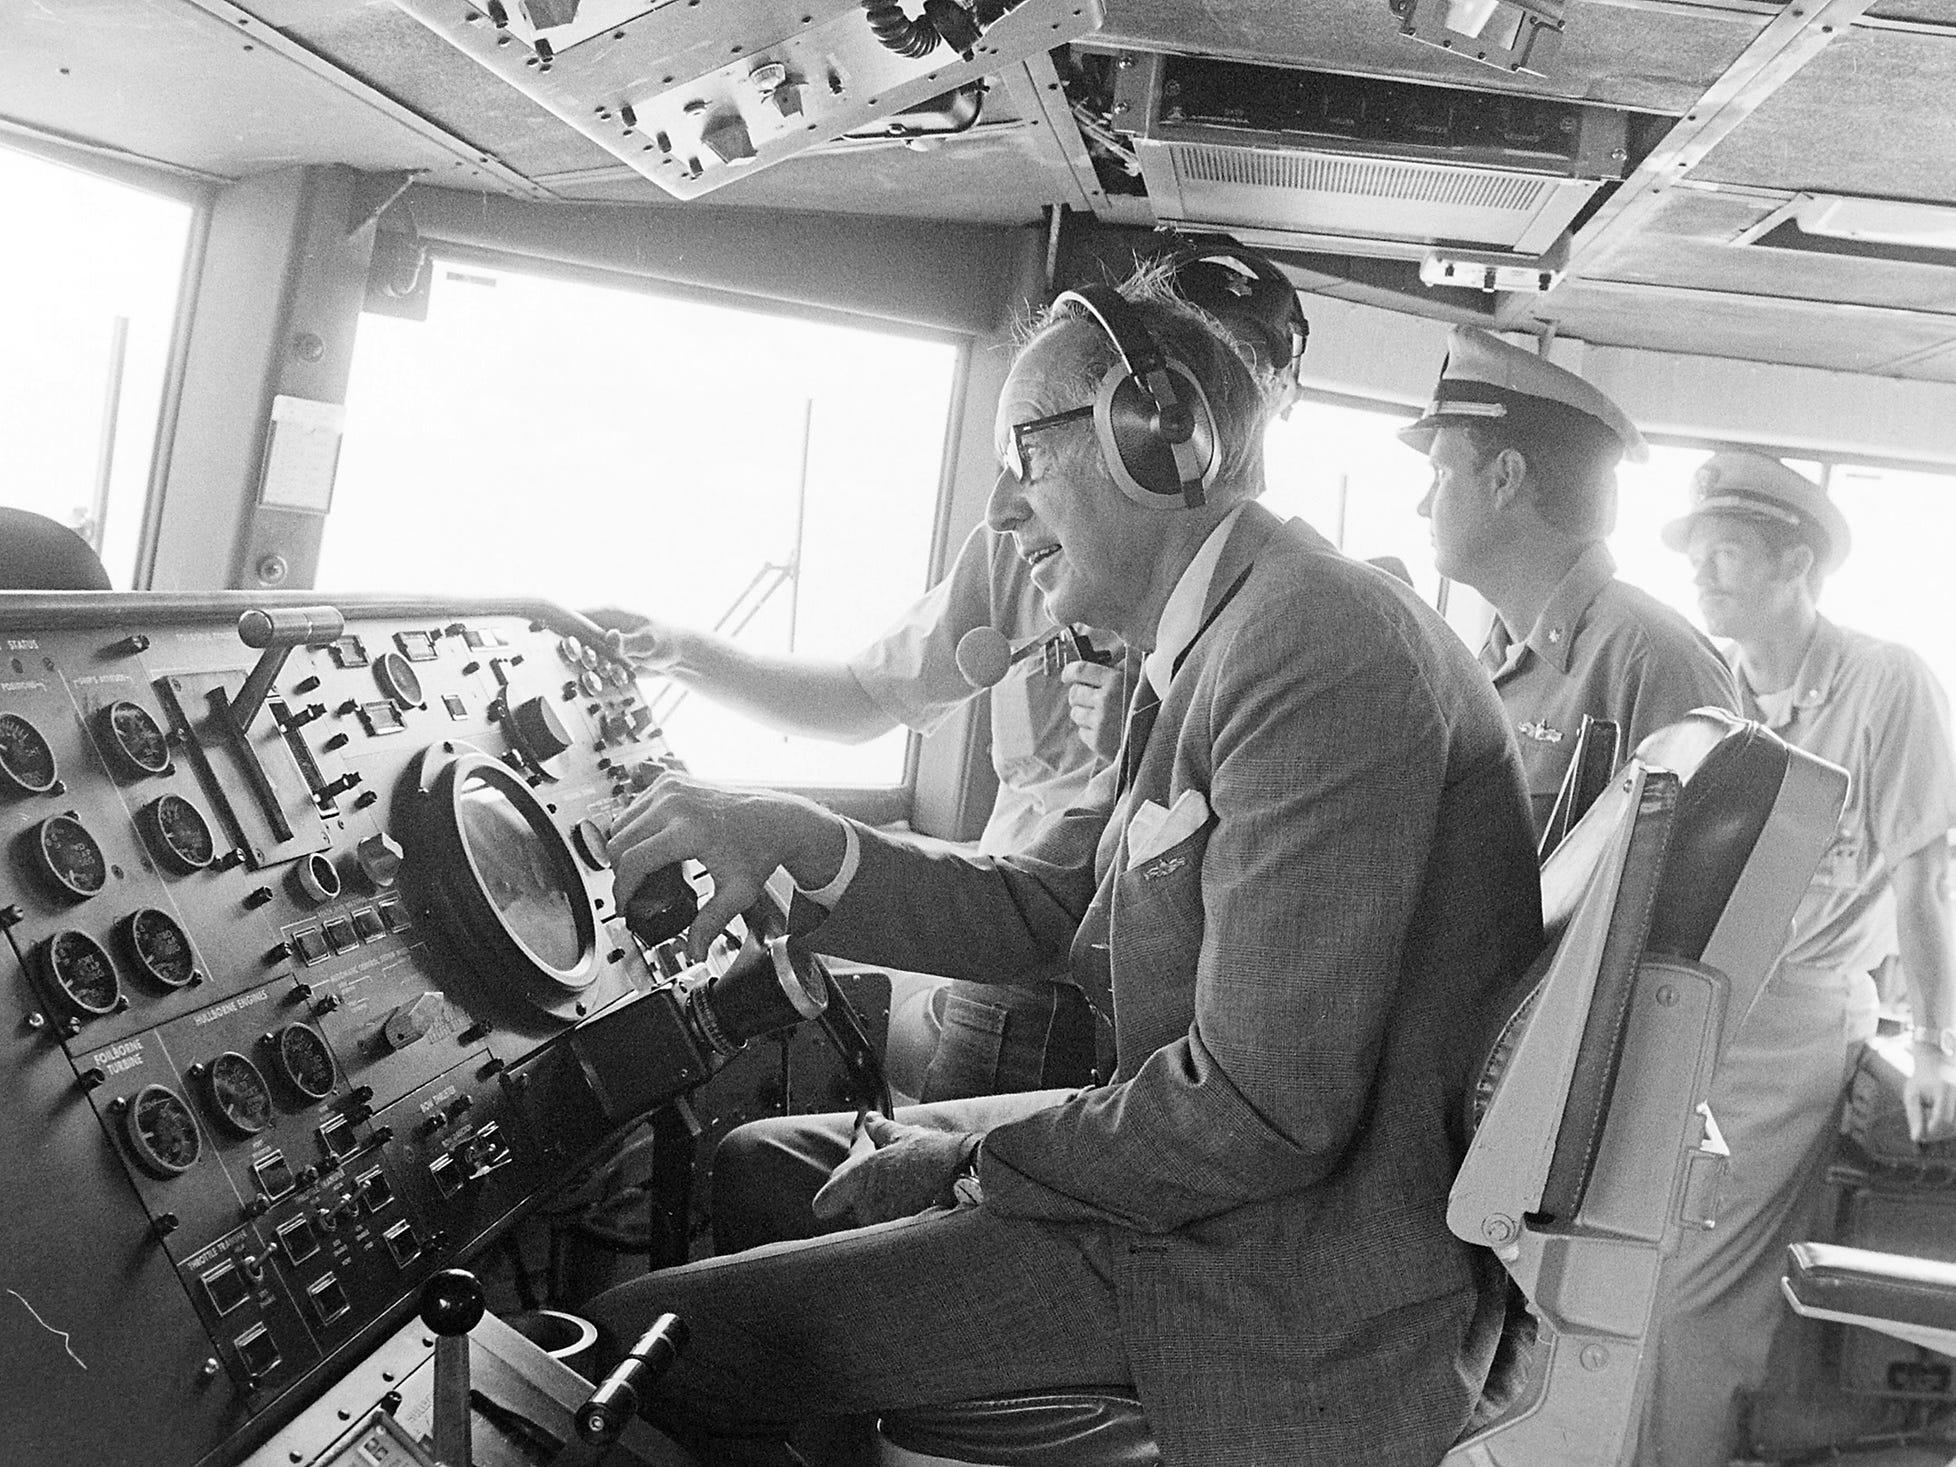 07/21/77Secretary Of Navy